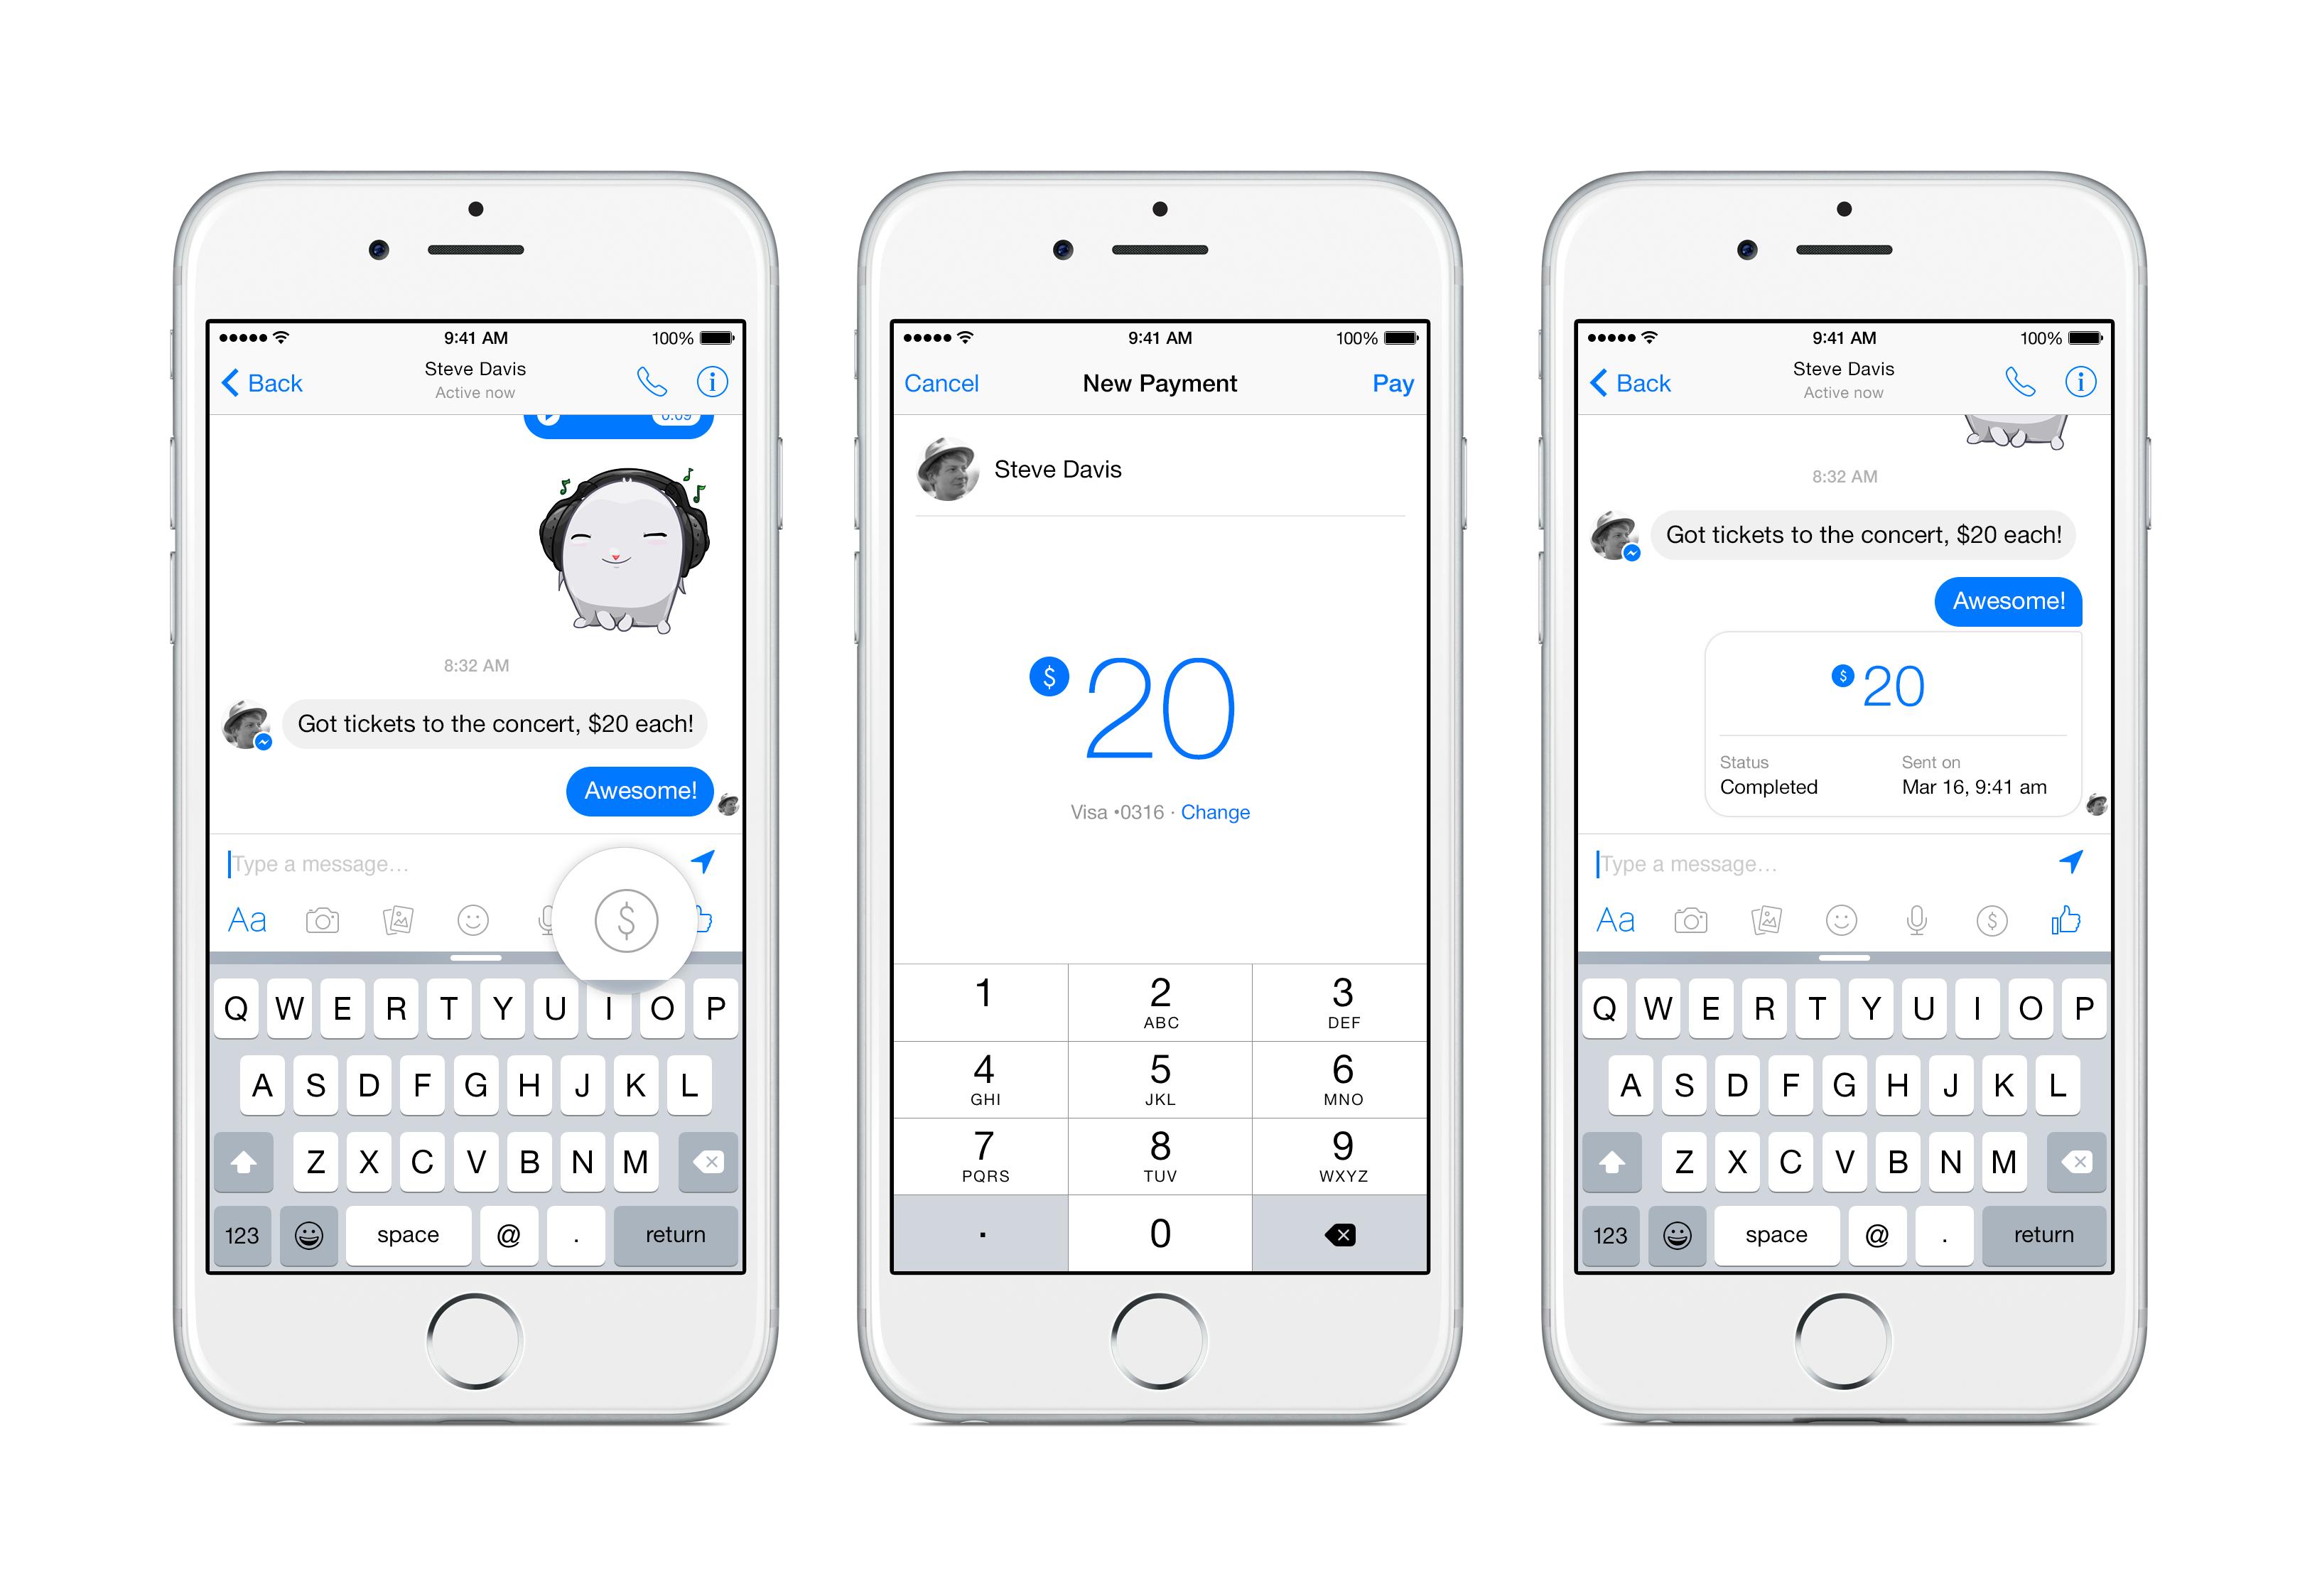 Facebook Messenger P2P payments